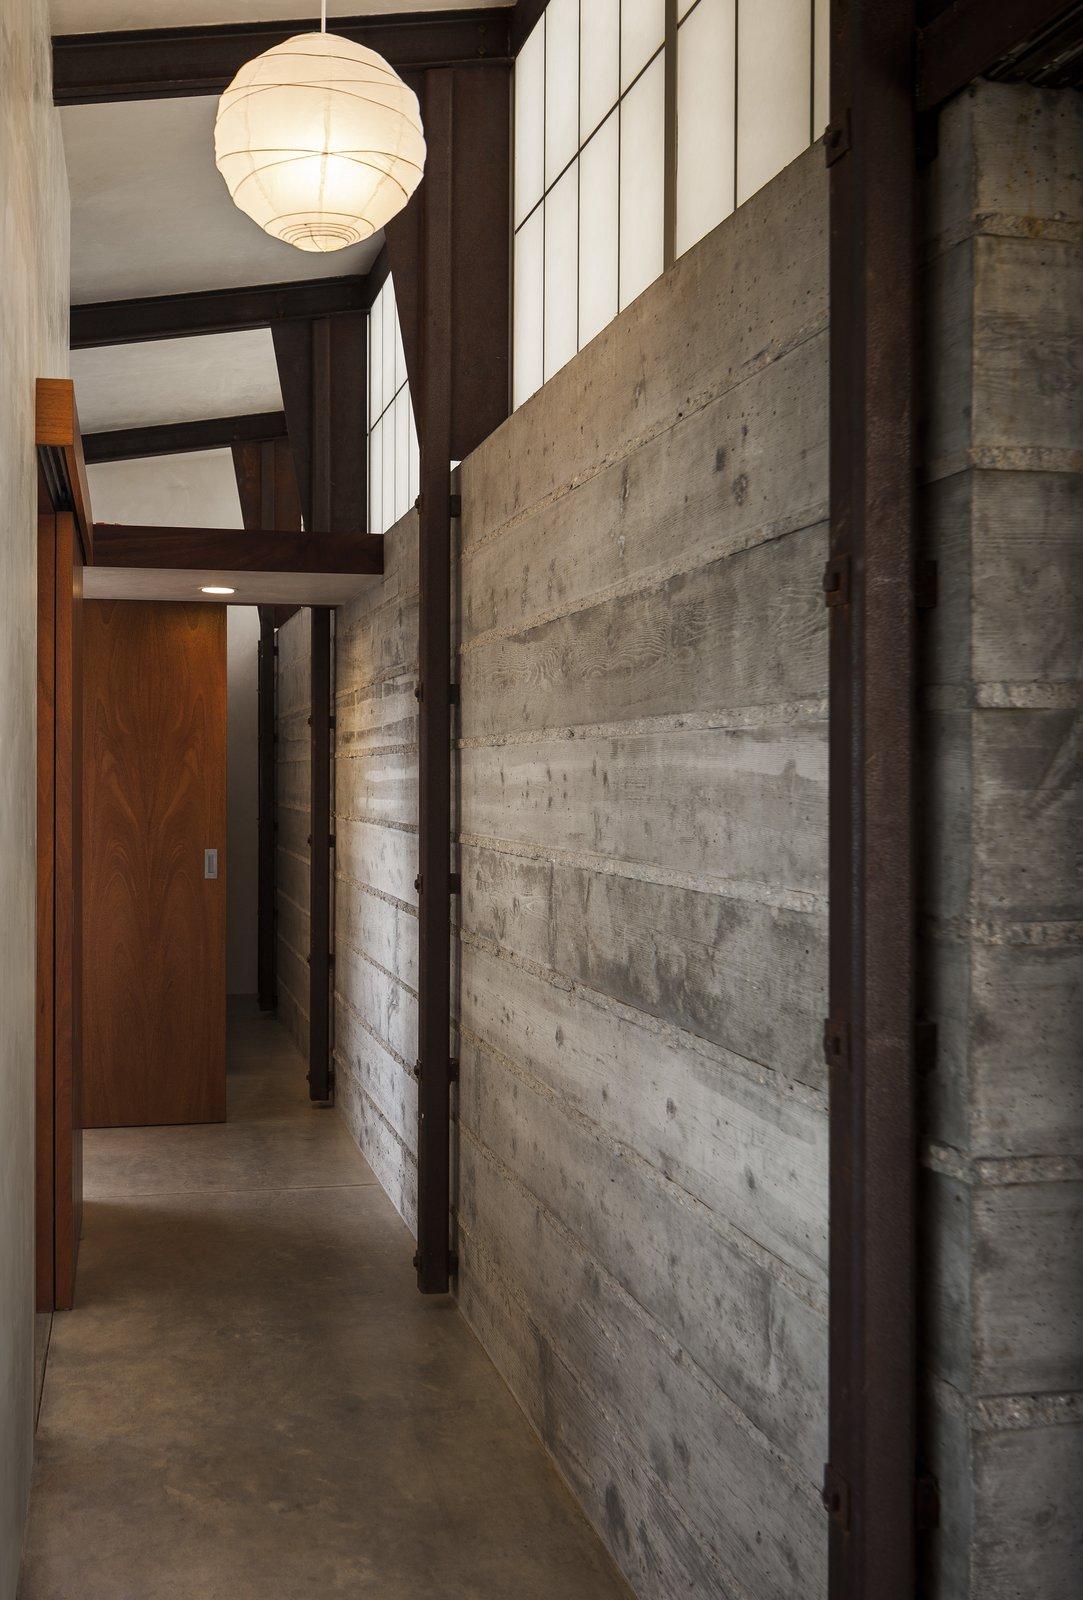 Hallway and Concrete Floor Bedroom Hallway  Crossing Wall House